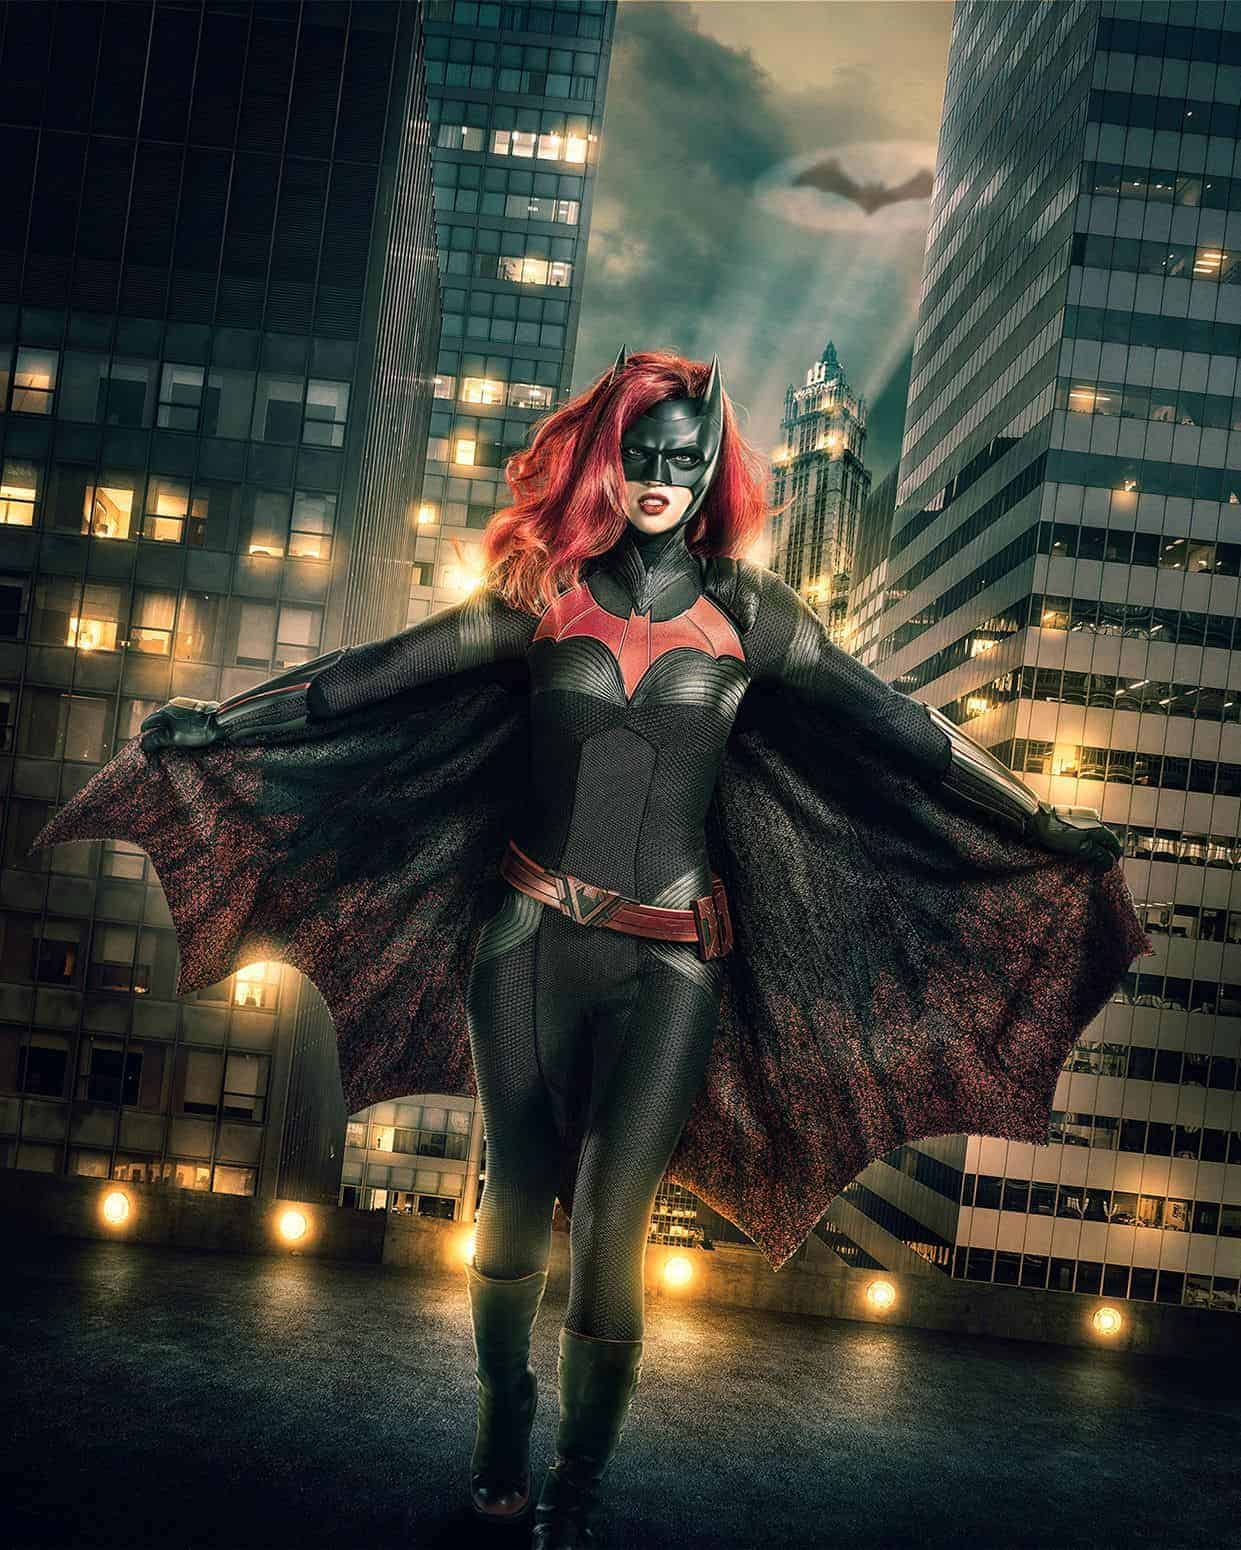 Batwoman Elseworlds Arrowverse Ruby Rose First Look 1138082, Hay una lesbiana en mi sopa